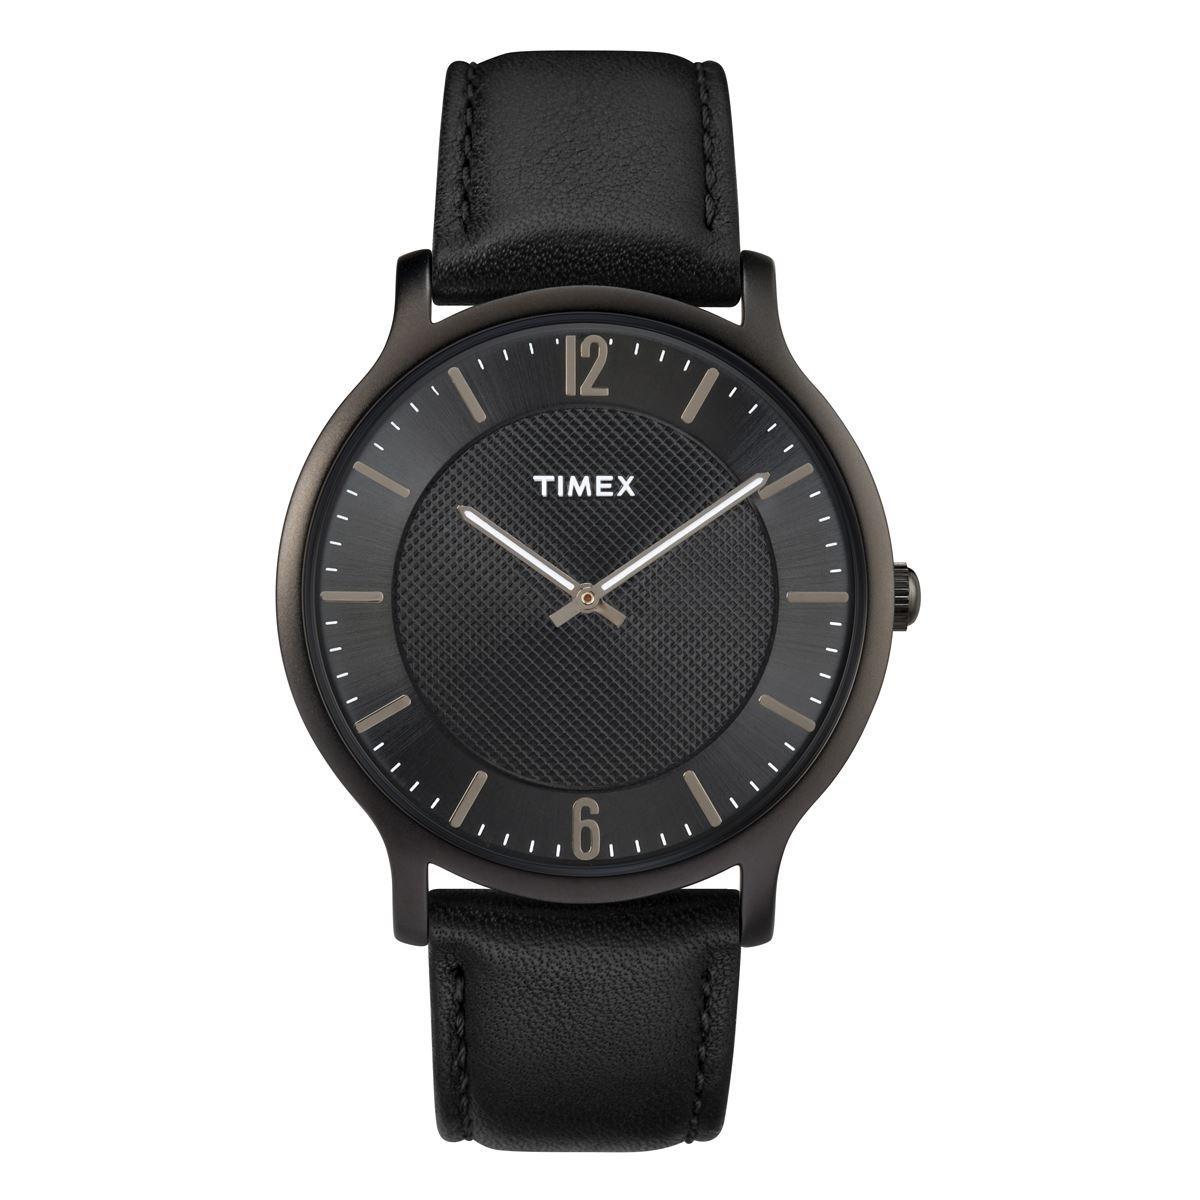 96ead26860fe reloj timex tw2r50100 100% original para caballero. Cargando zoom.